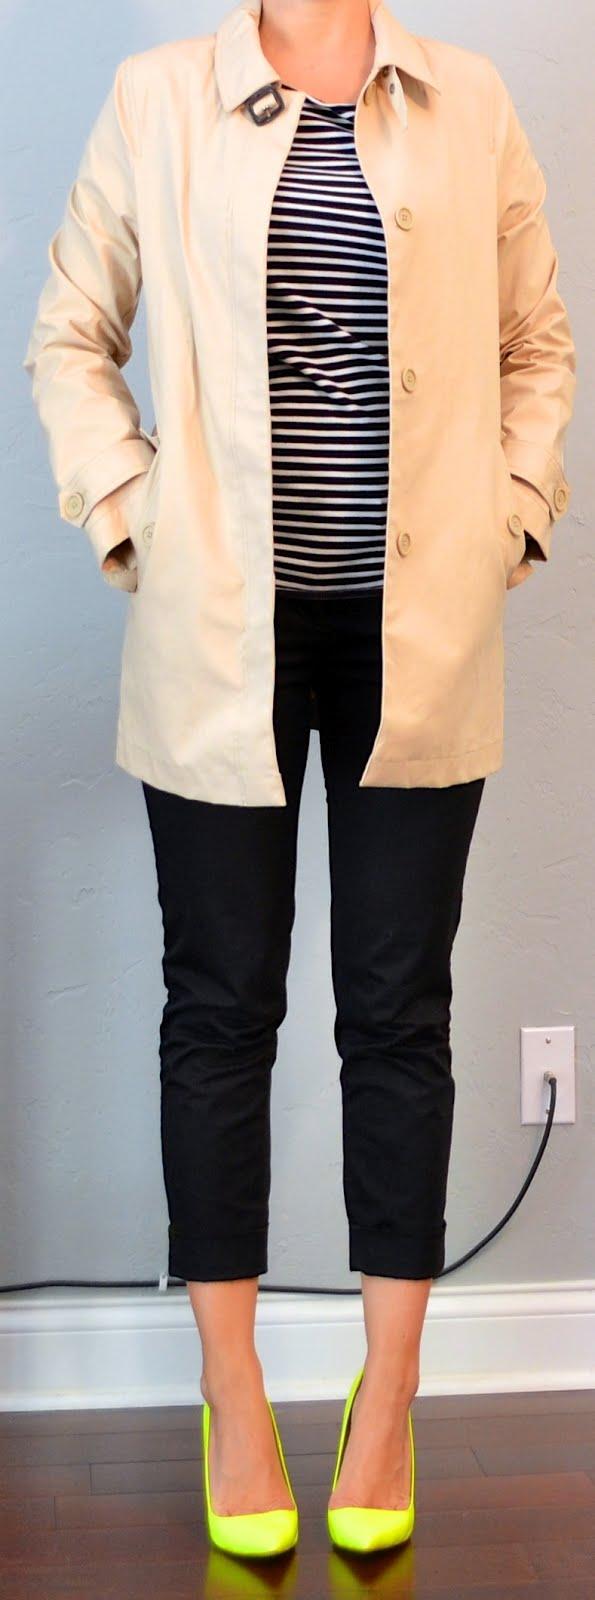 Outfit Post Striped Shirt Black Cropped Pants Tan